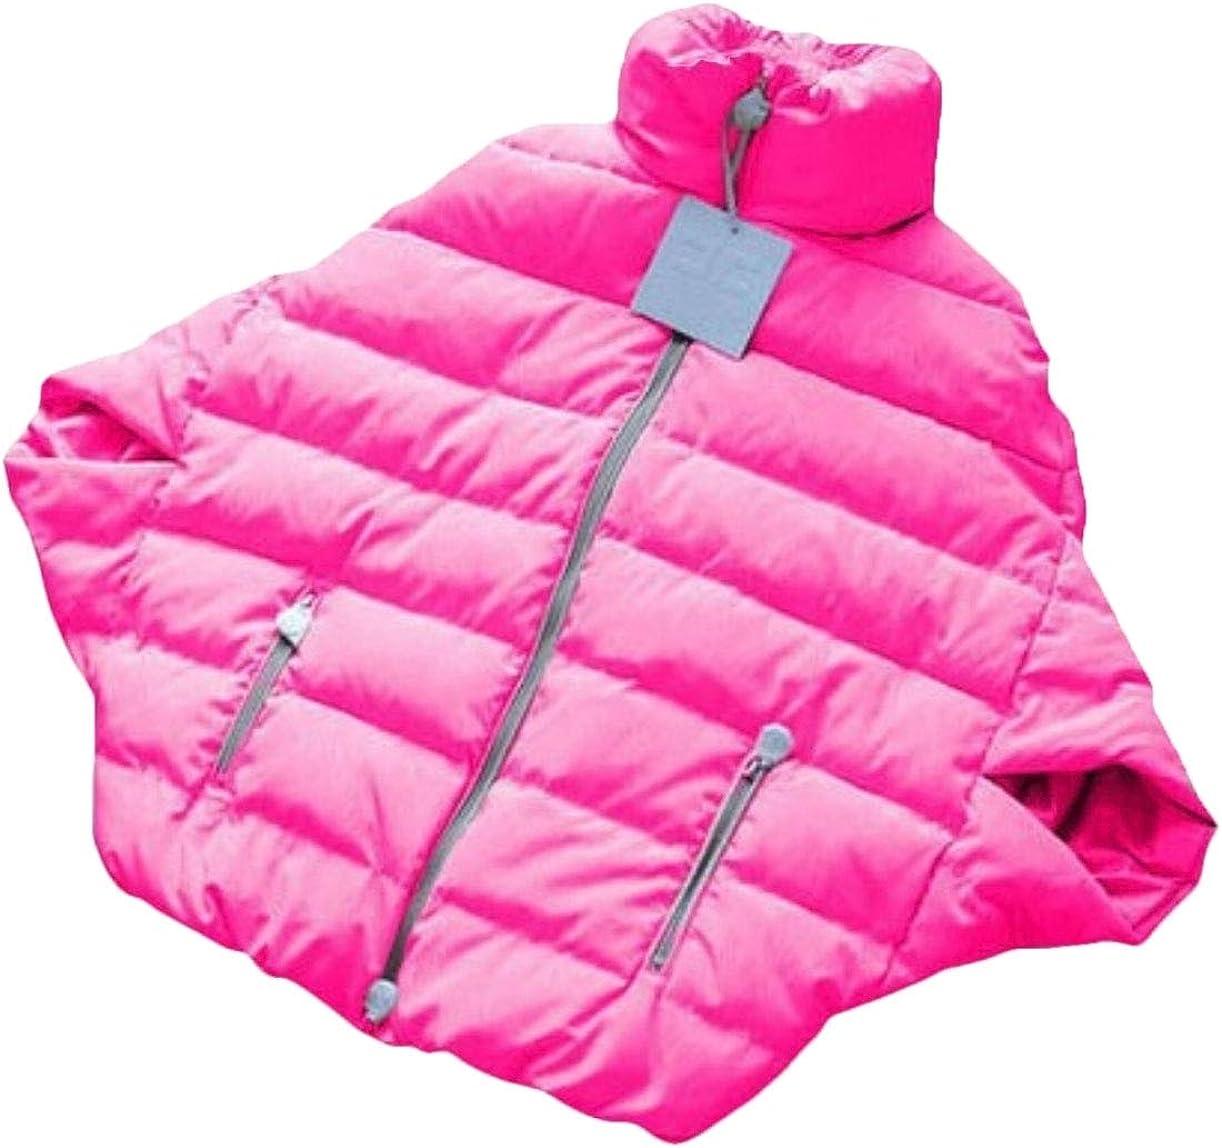 desolateness Womens Jacket Warm Coat Batwing Sleeve Cape Poncho Coat 1 XL